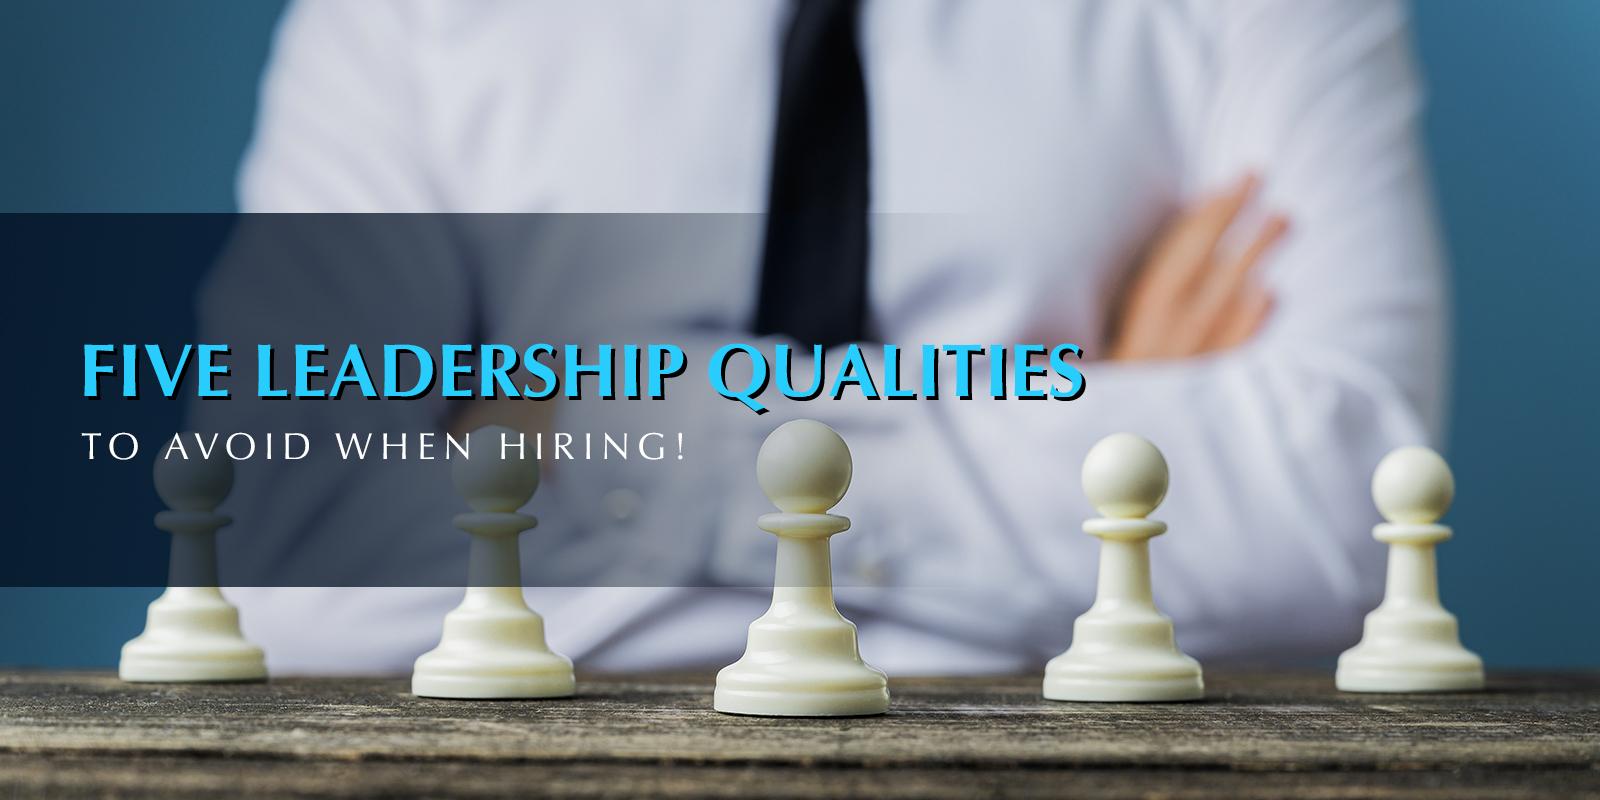 Five Leadership Qualities To Avoid When Hiring!